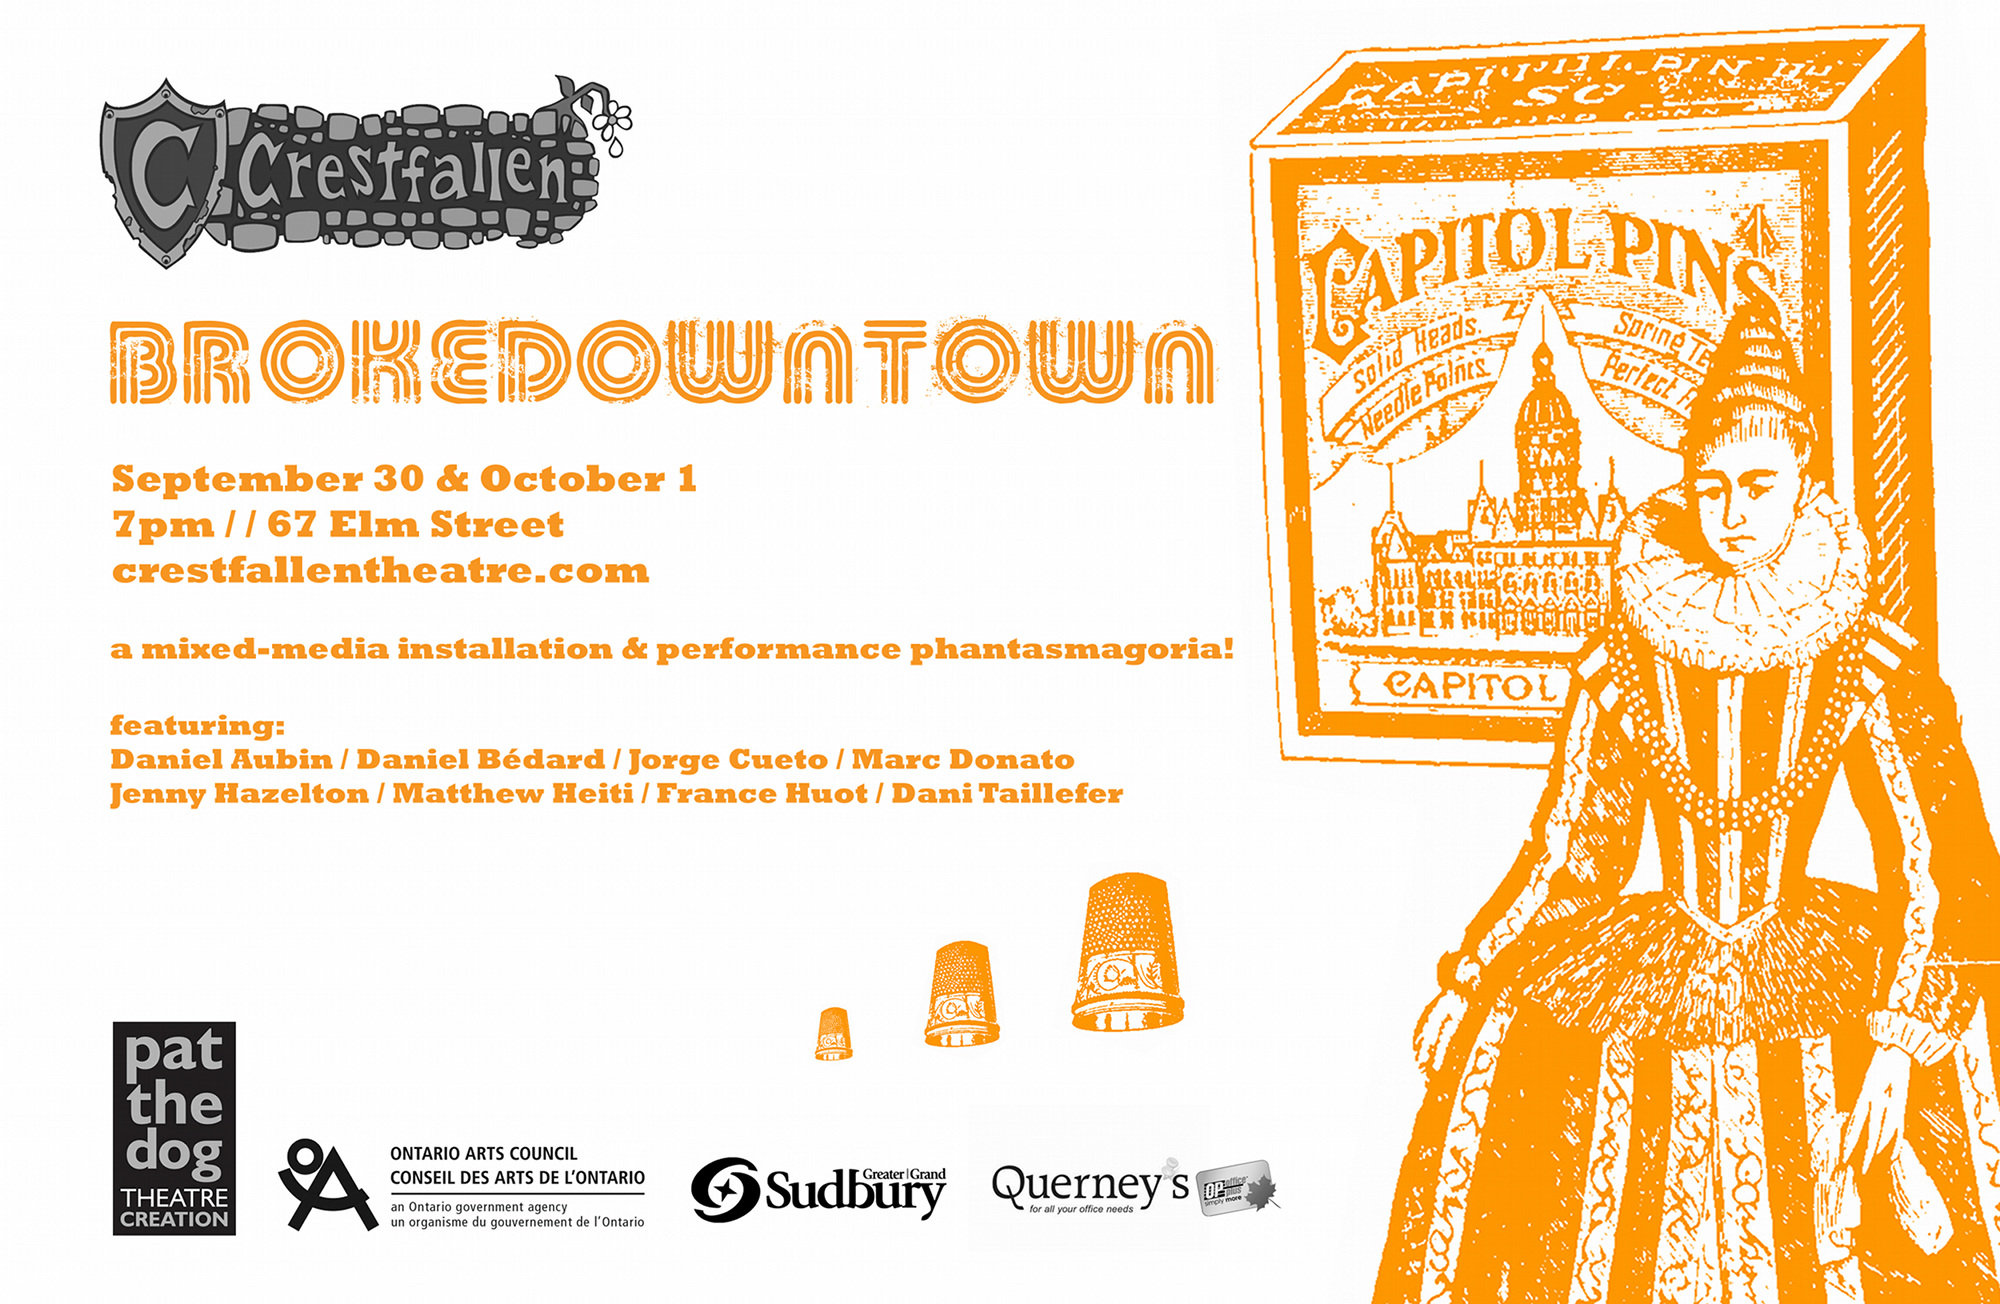 brokedowntown-e-poster